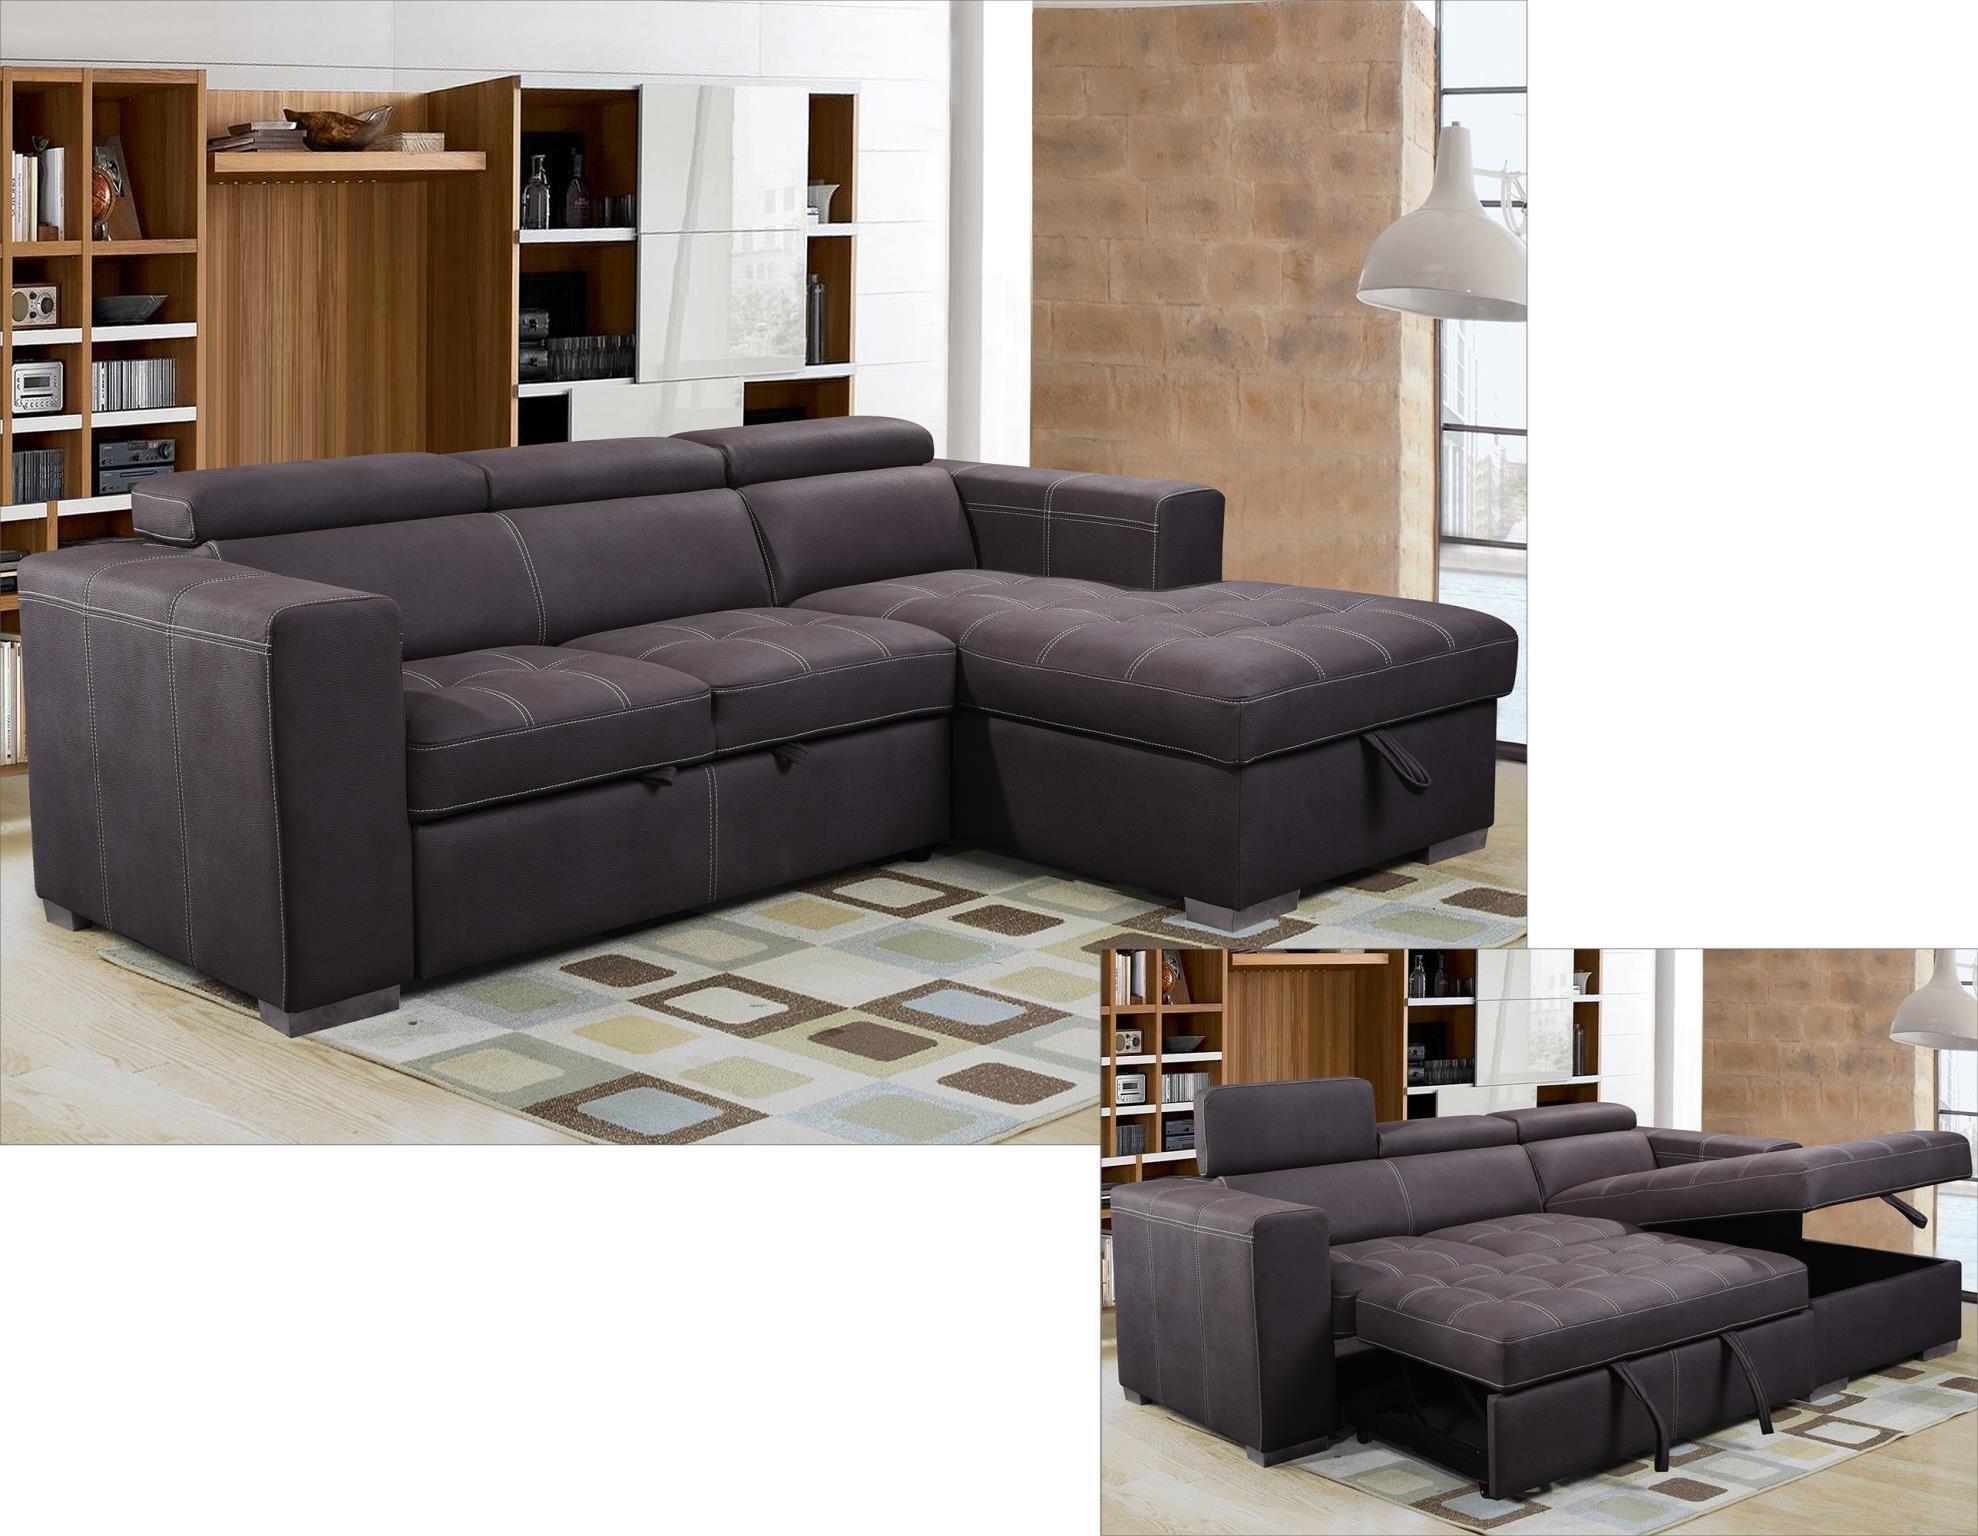 Amando Media Sofa by Primo International at Furniture Fair - North Carolina